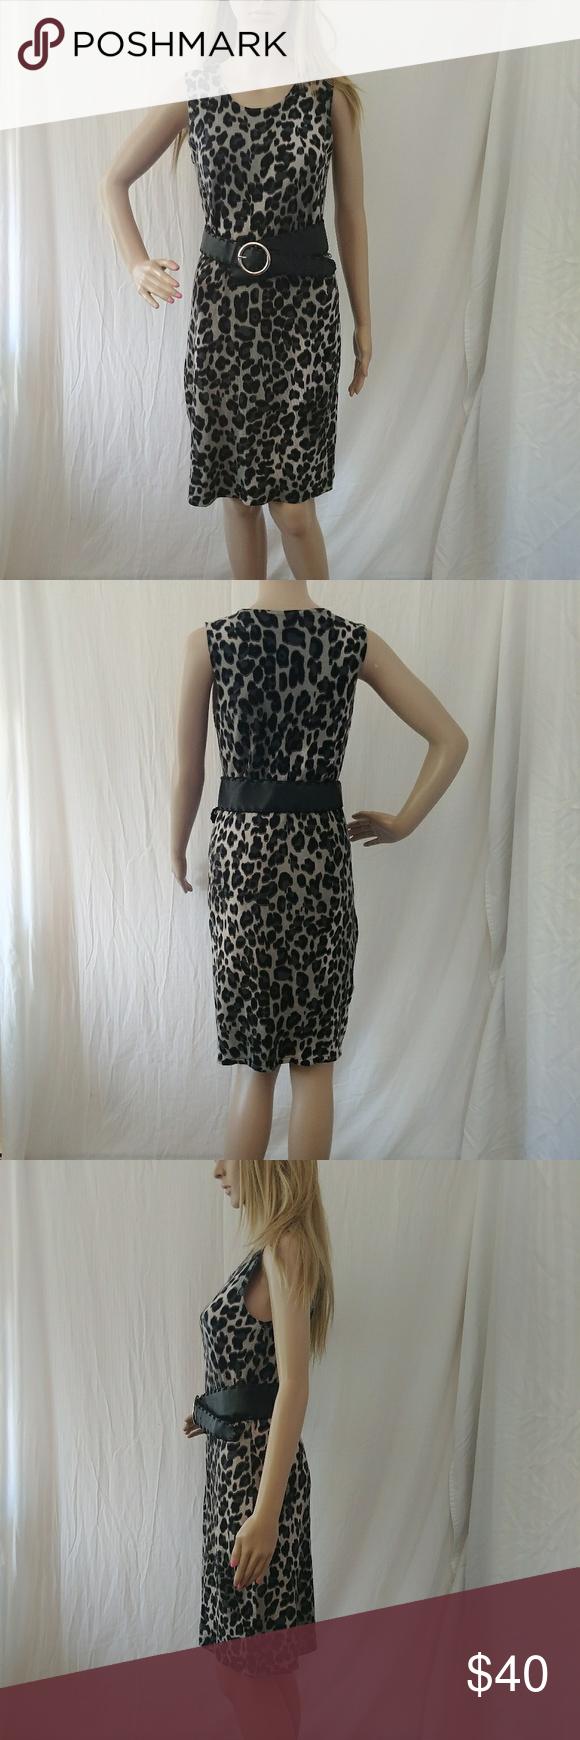 c9a36b9c902c Calvin Klein Sweater tank dress Nice leopard print sweater dress. Belt not  included Calvin Klein Dresses Midi